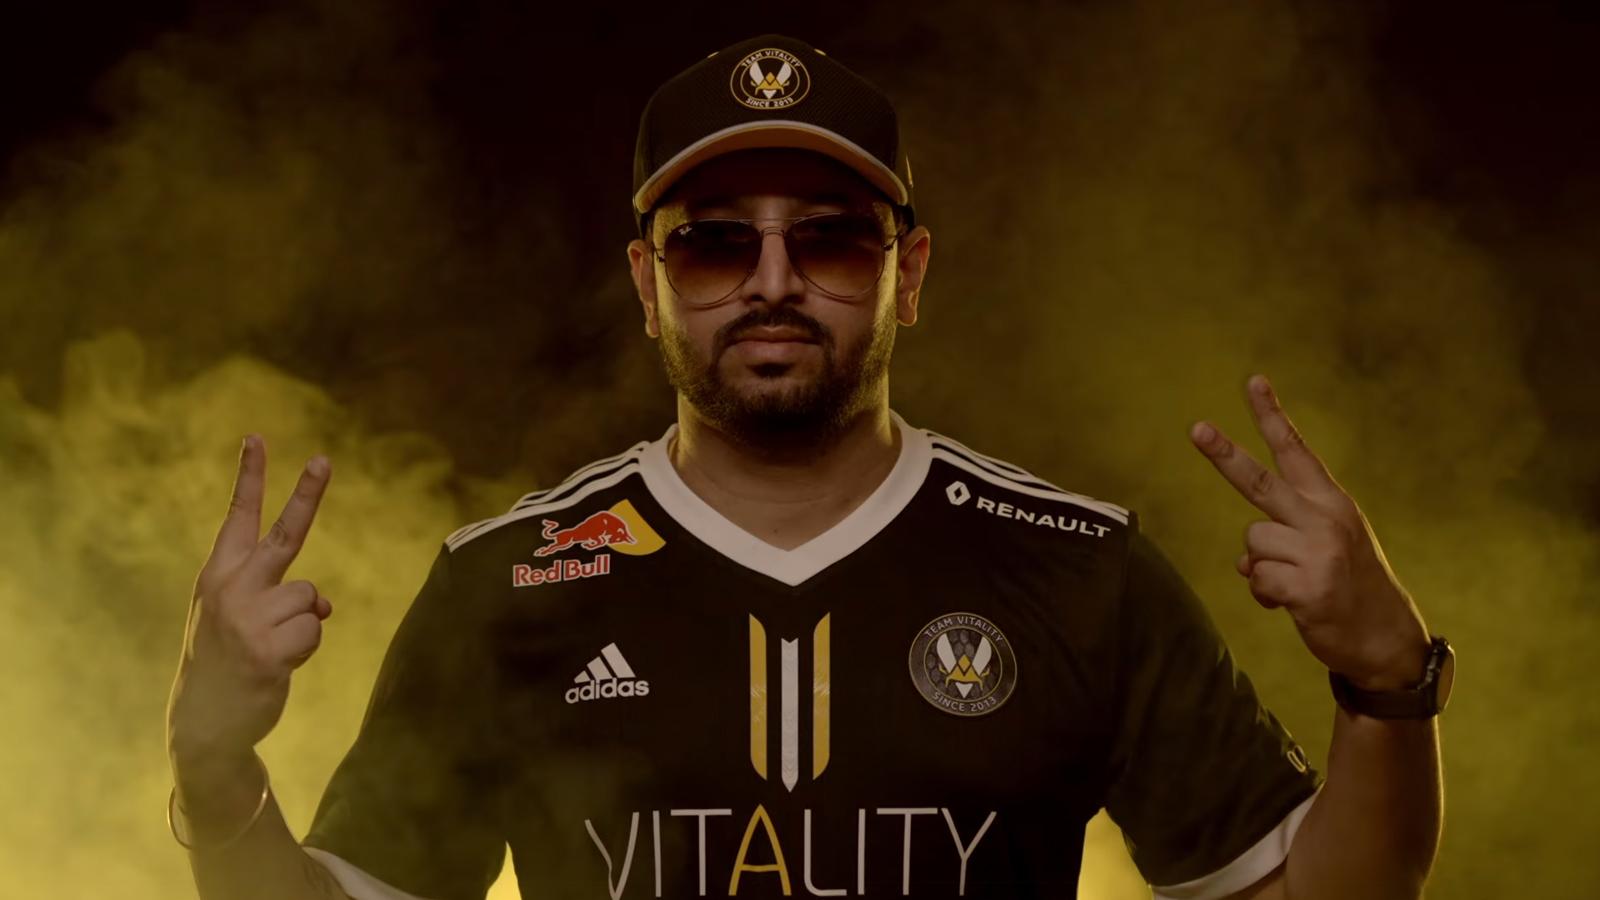 Team Vitality enters India